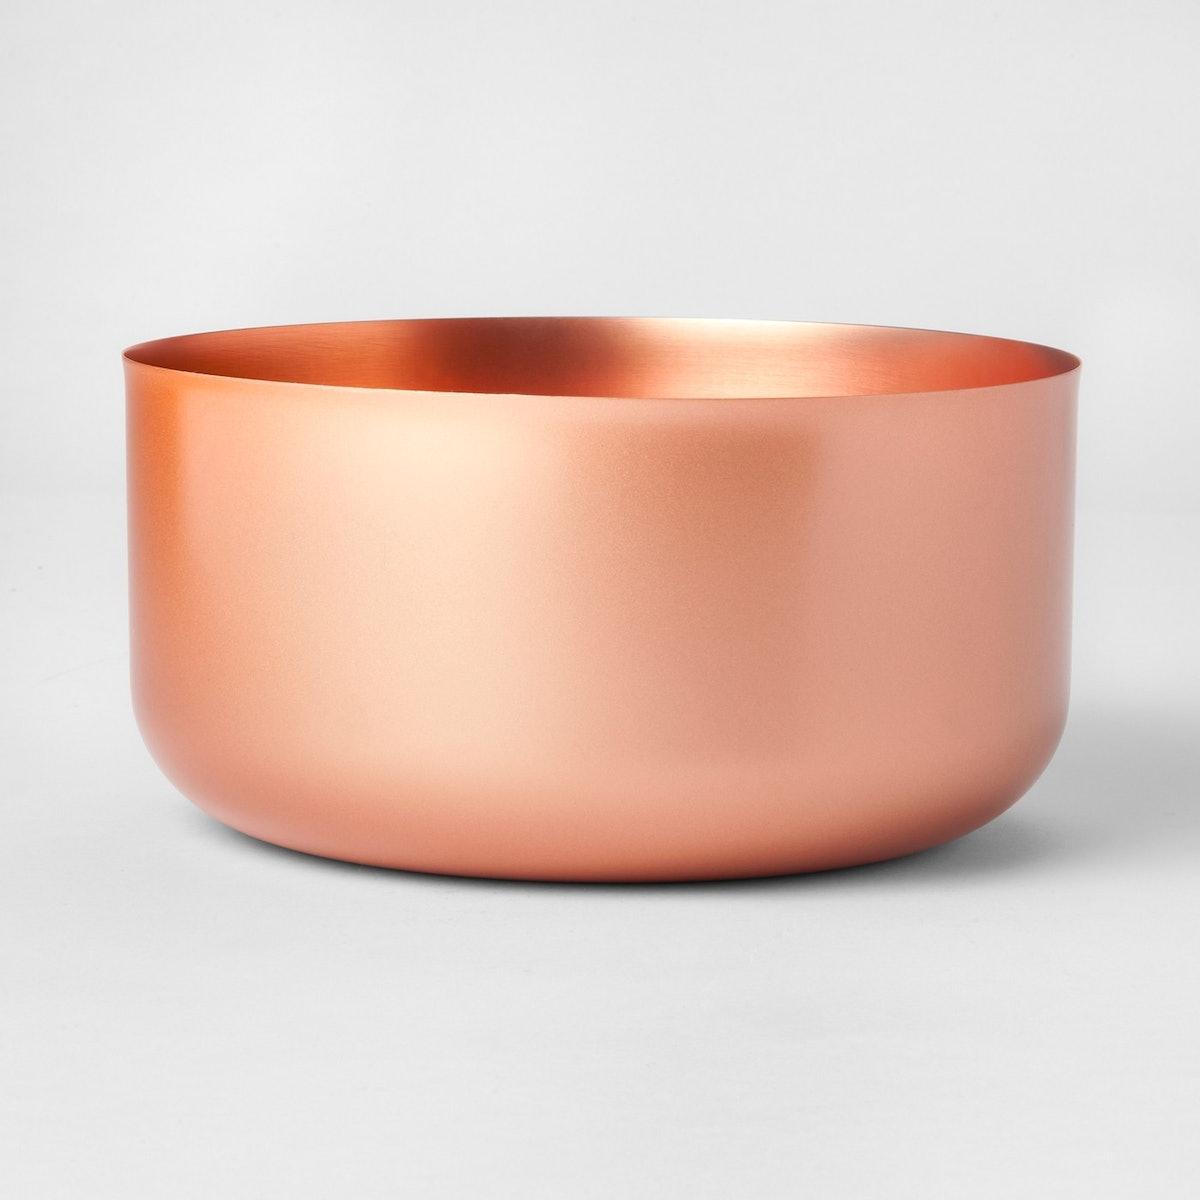 Serving Bowl - Copper - Project 62